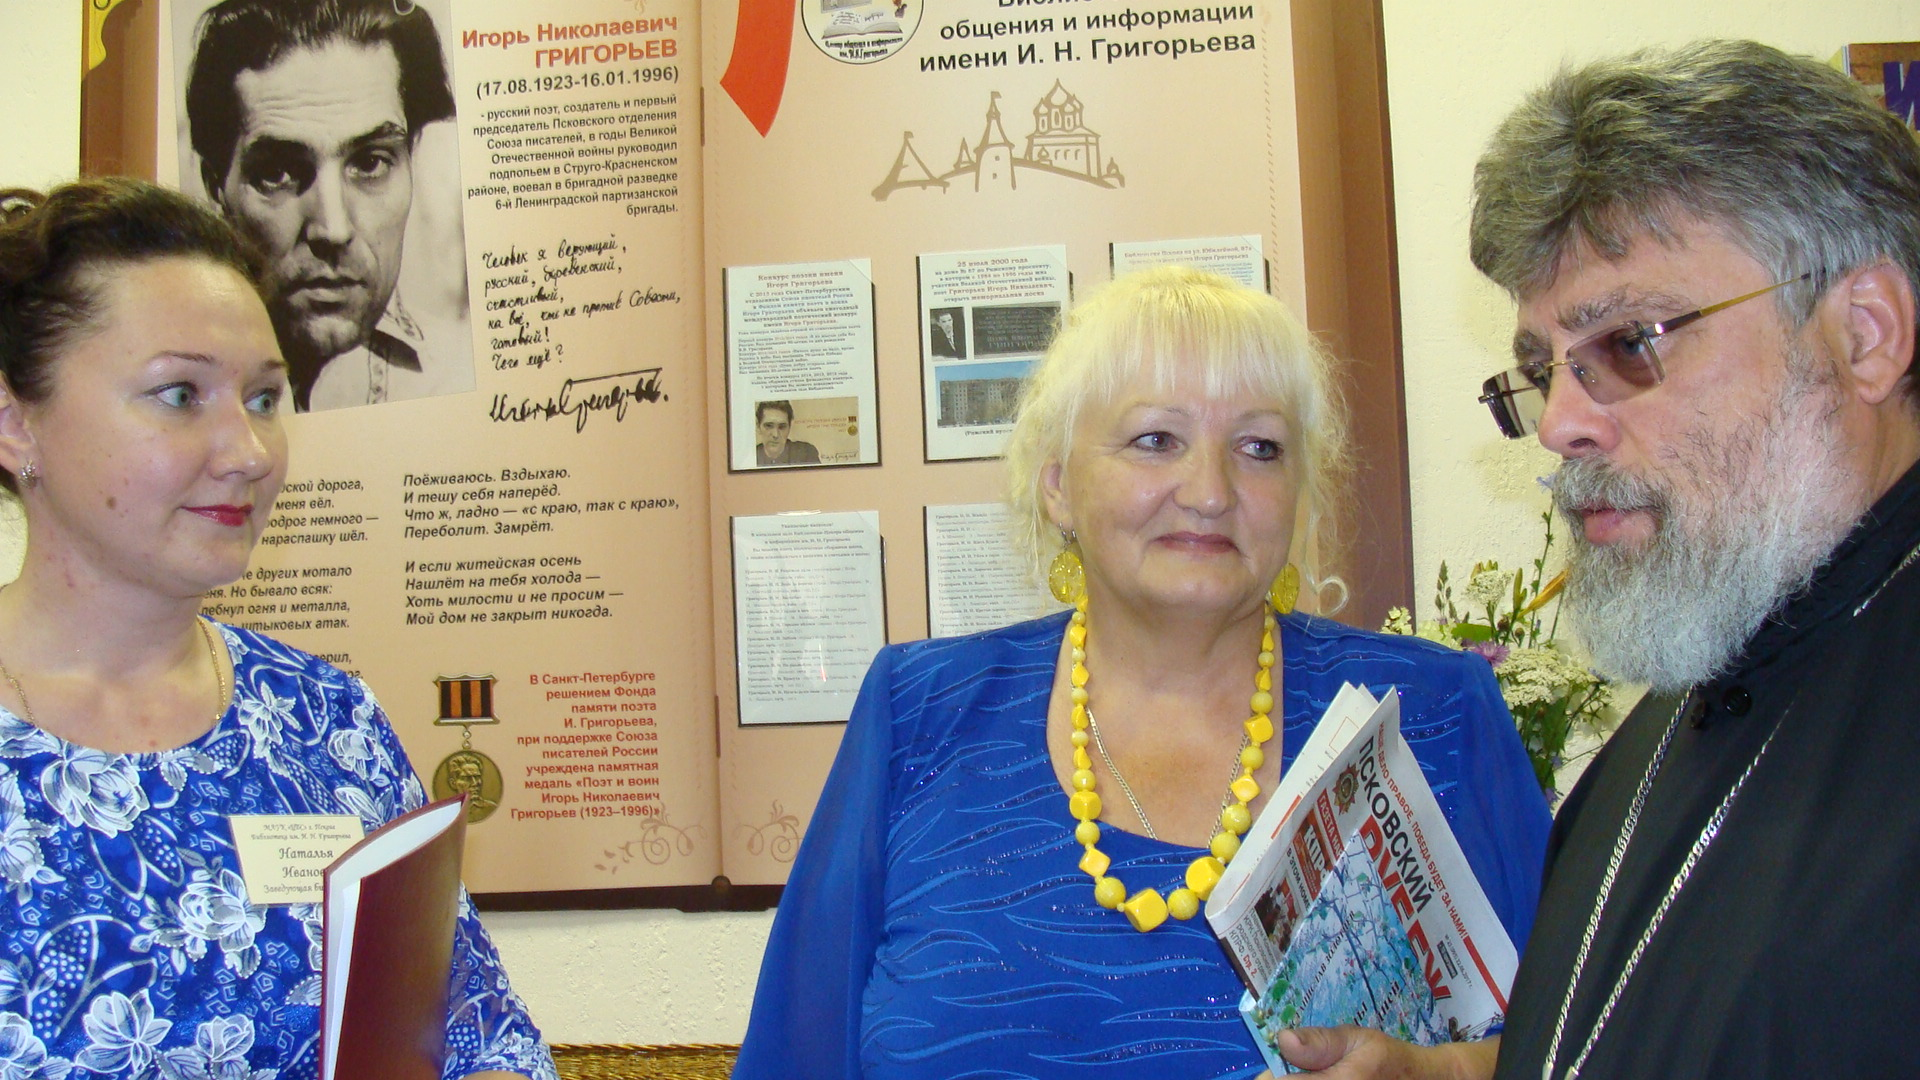 Конкурс имени игоря григорьева 2018